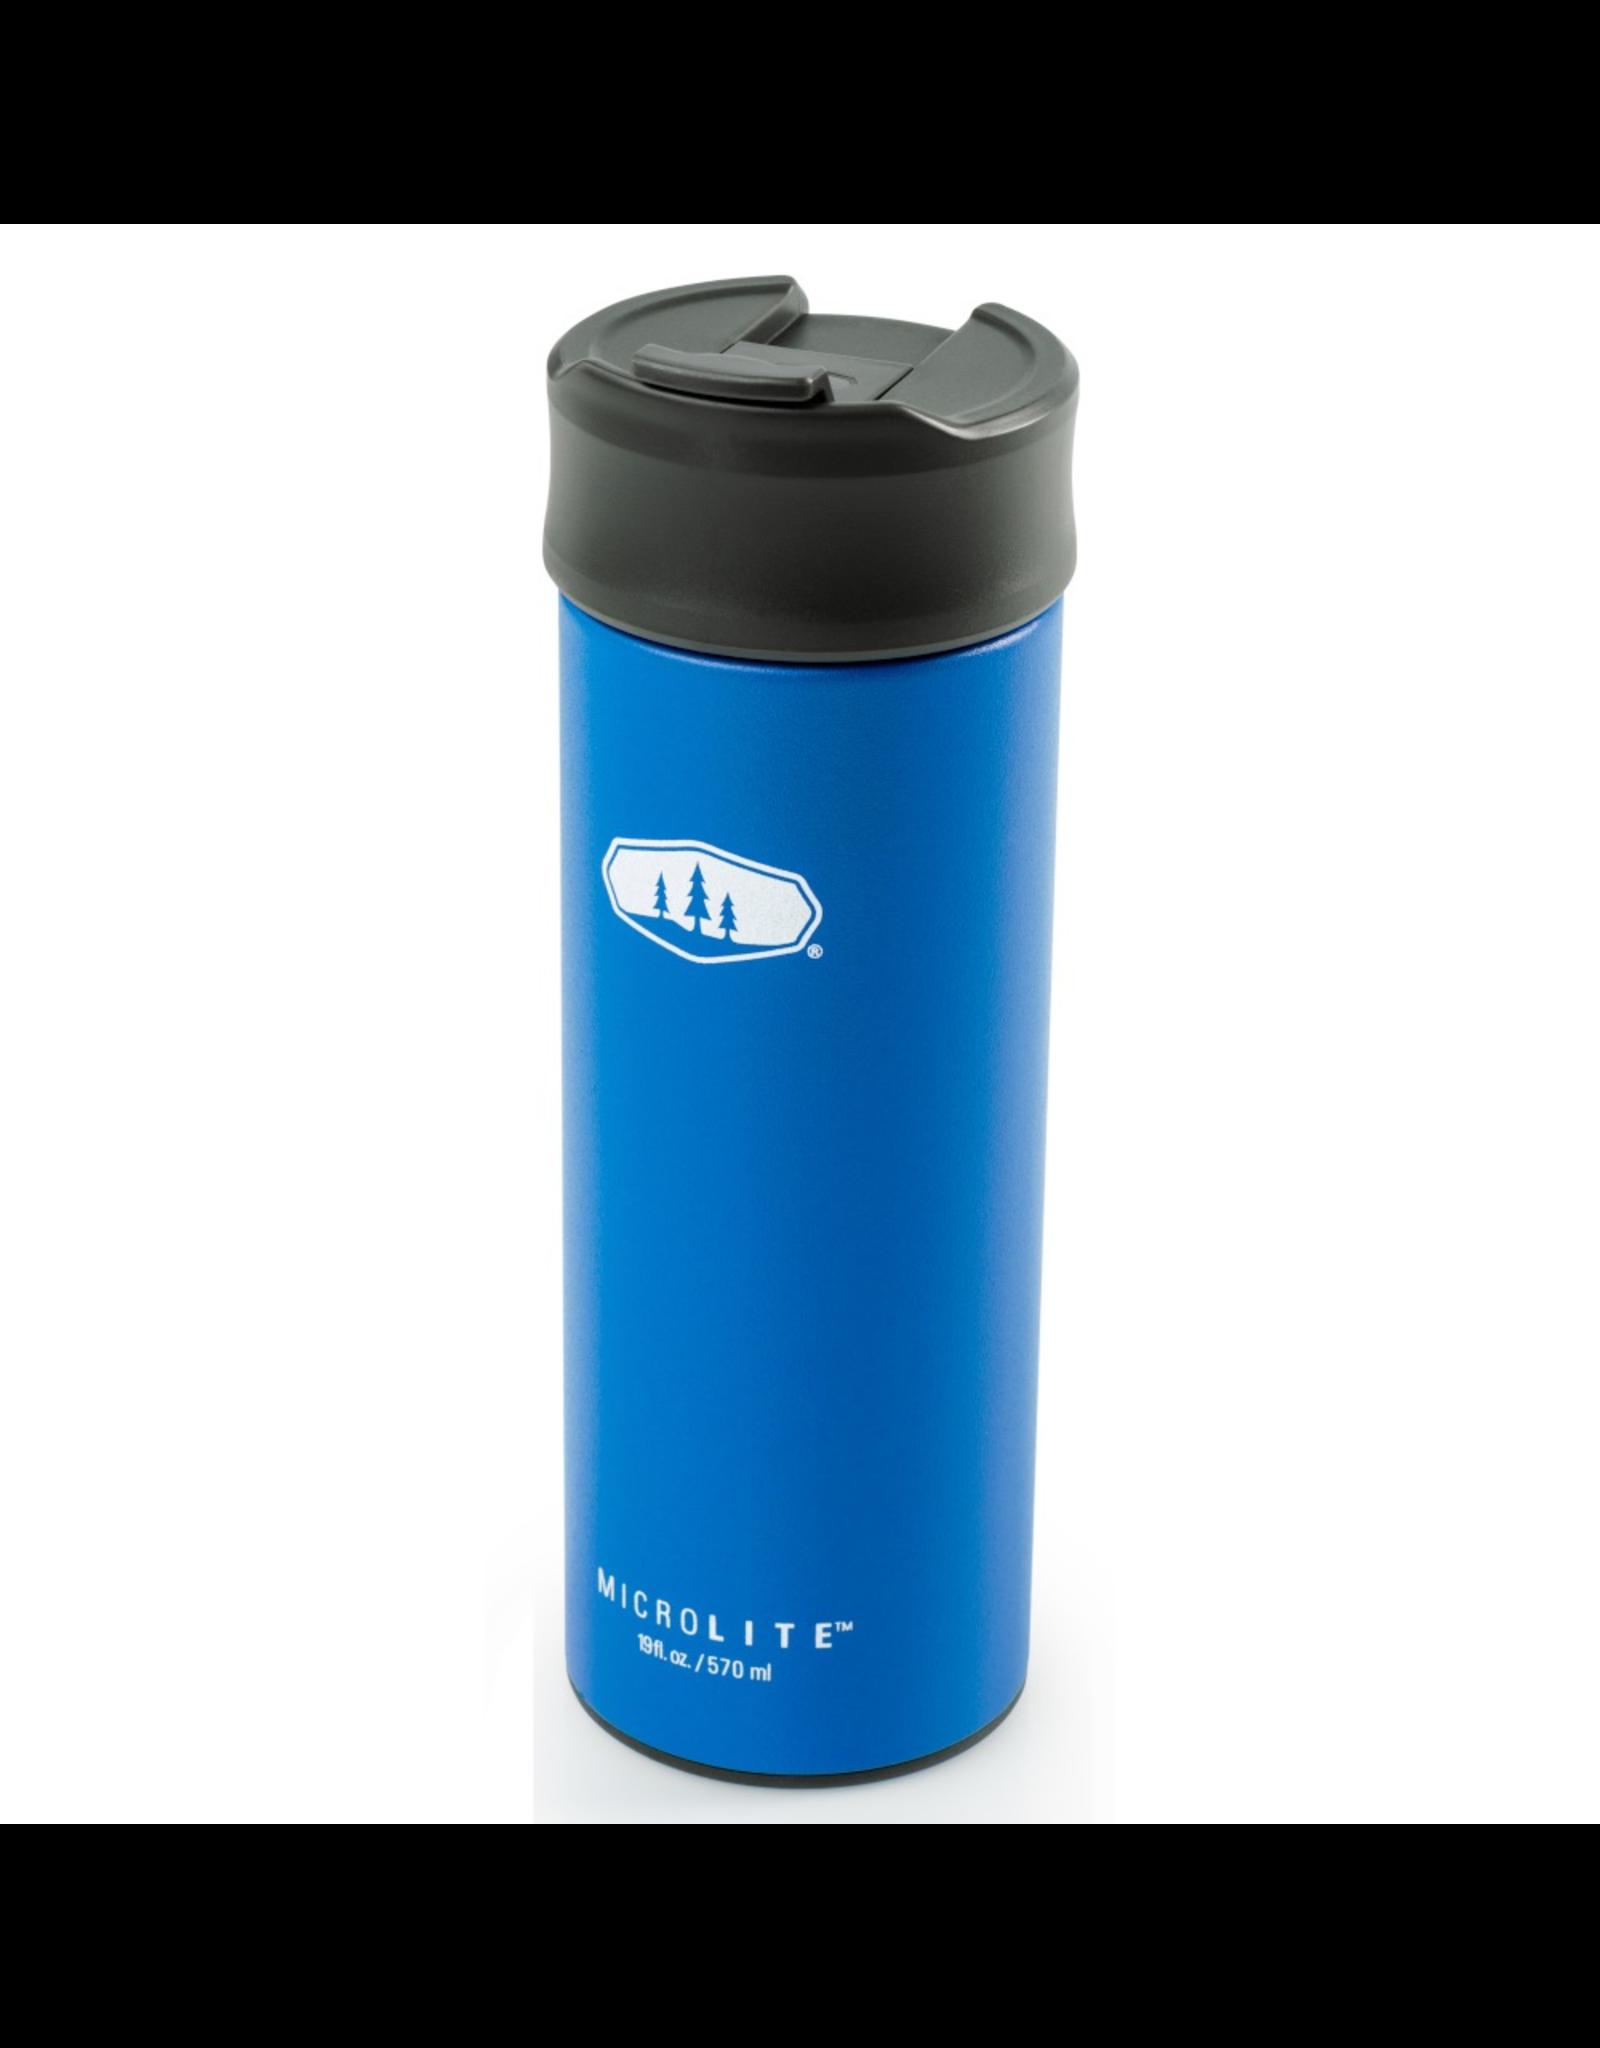 GSI Outdoors Microlite 570 Tour Insulated Mug